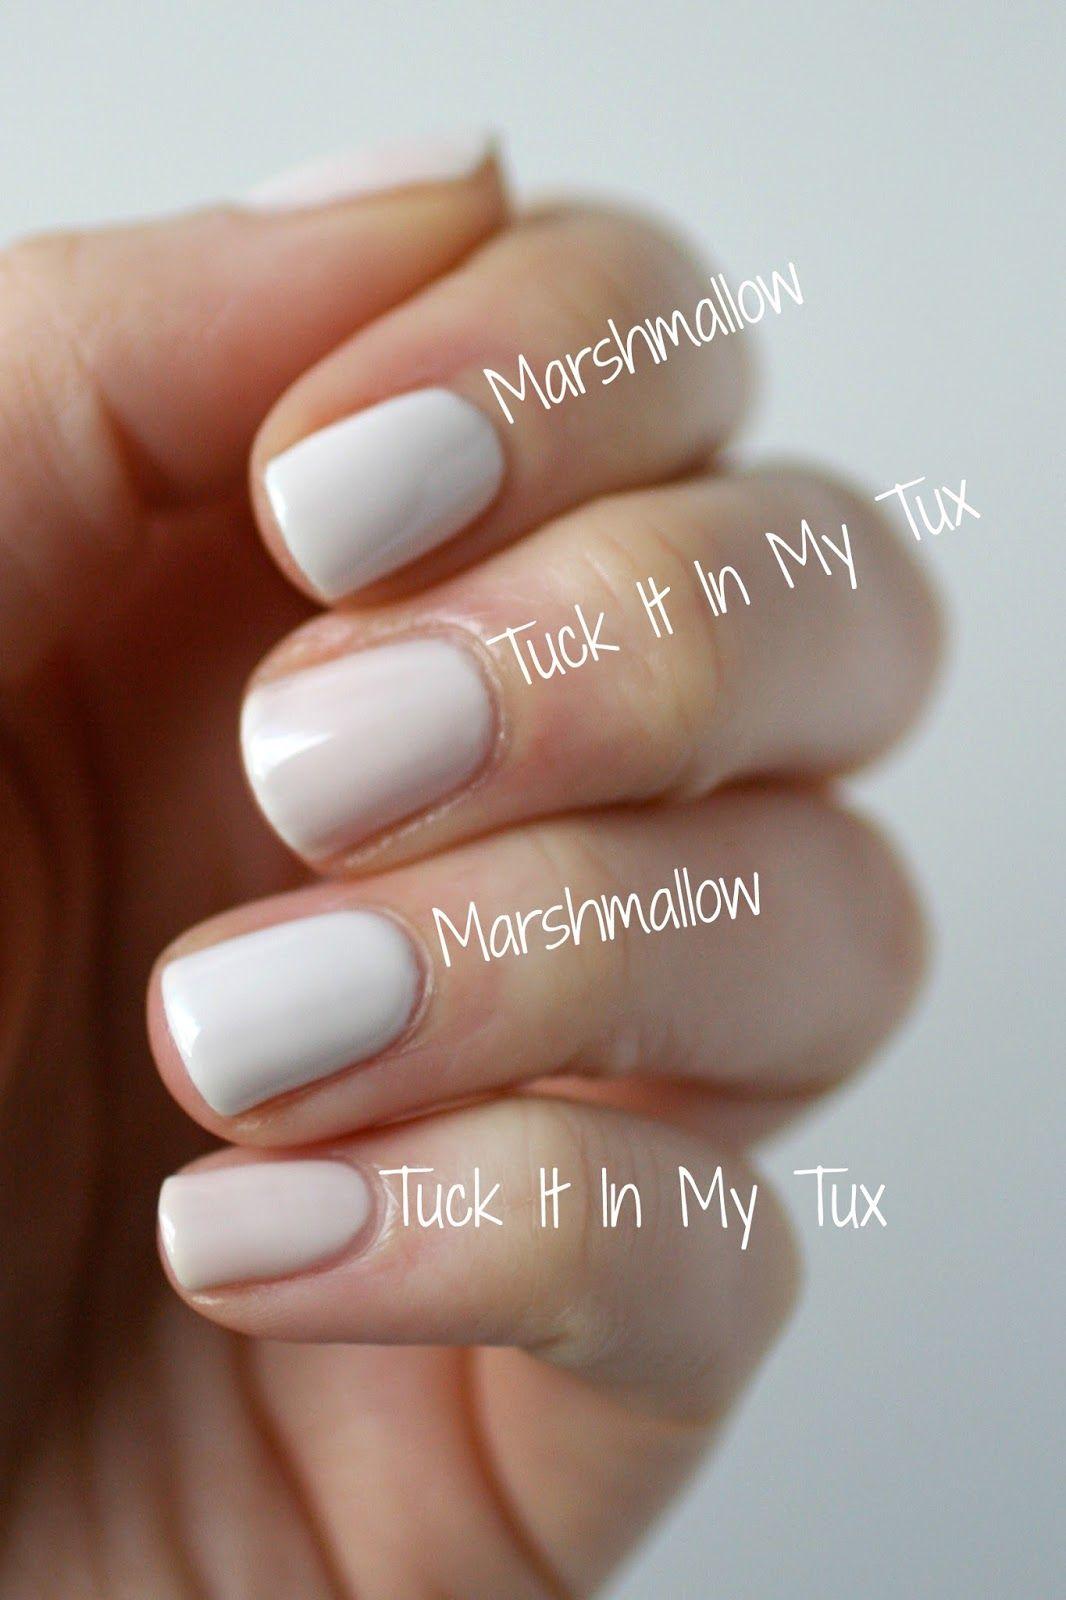 Essie Tuck It In My Tux vs. Essie Marshmallow | Polish Freak ...